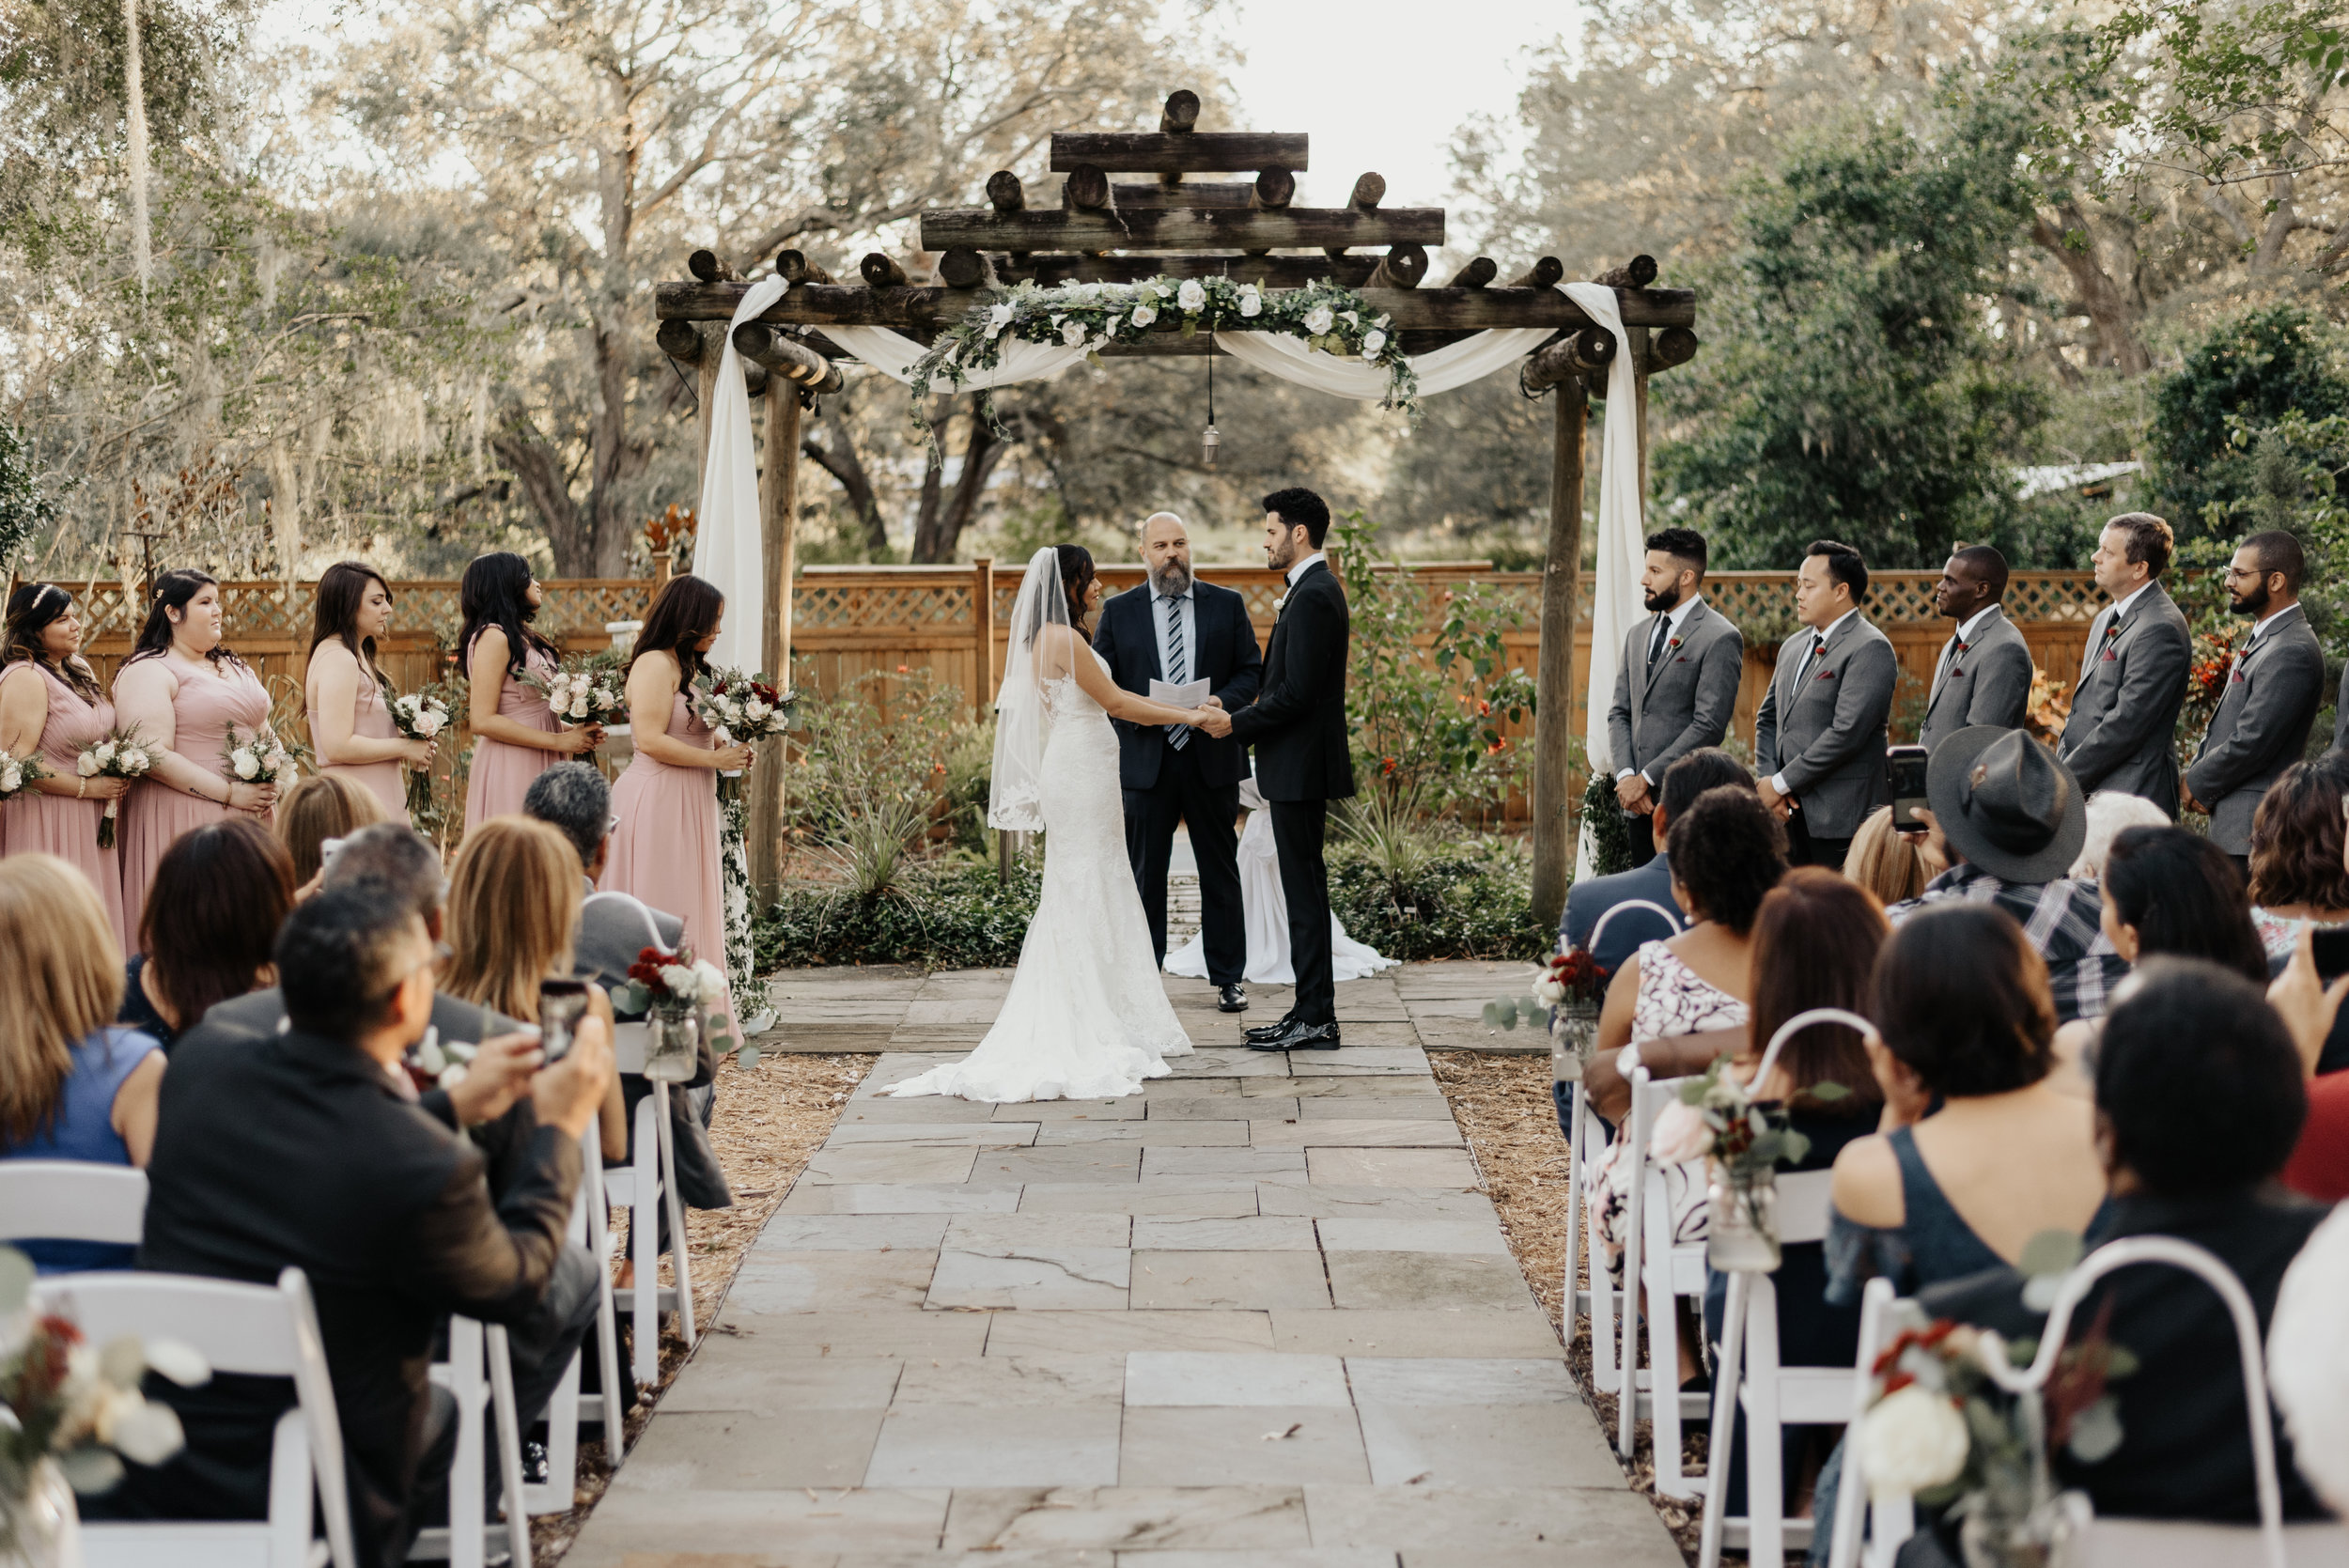 Kirstie-AJ-Wedding-8764.jpg